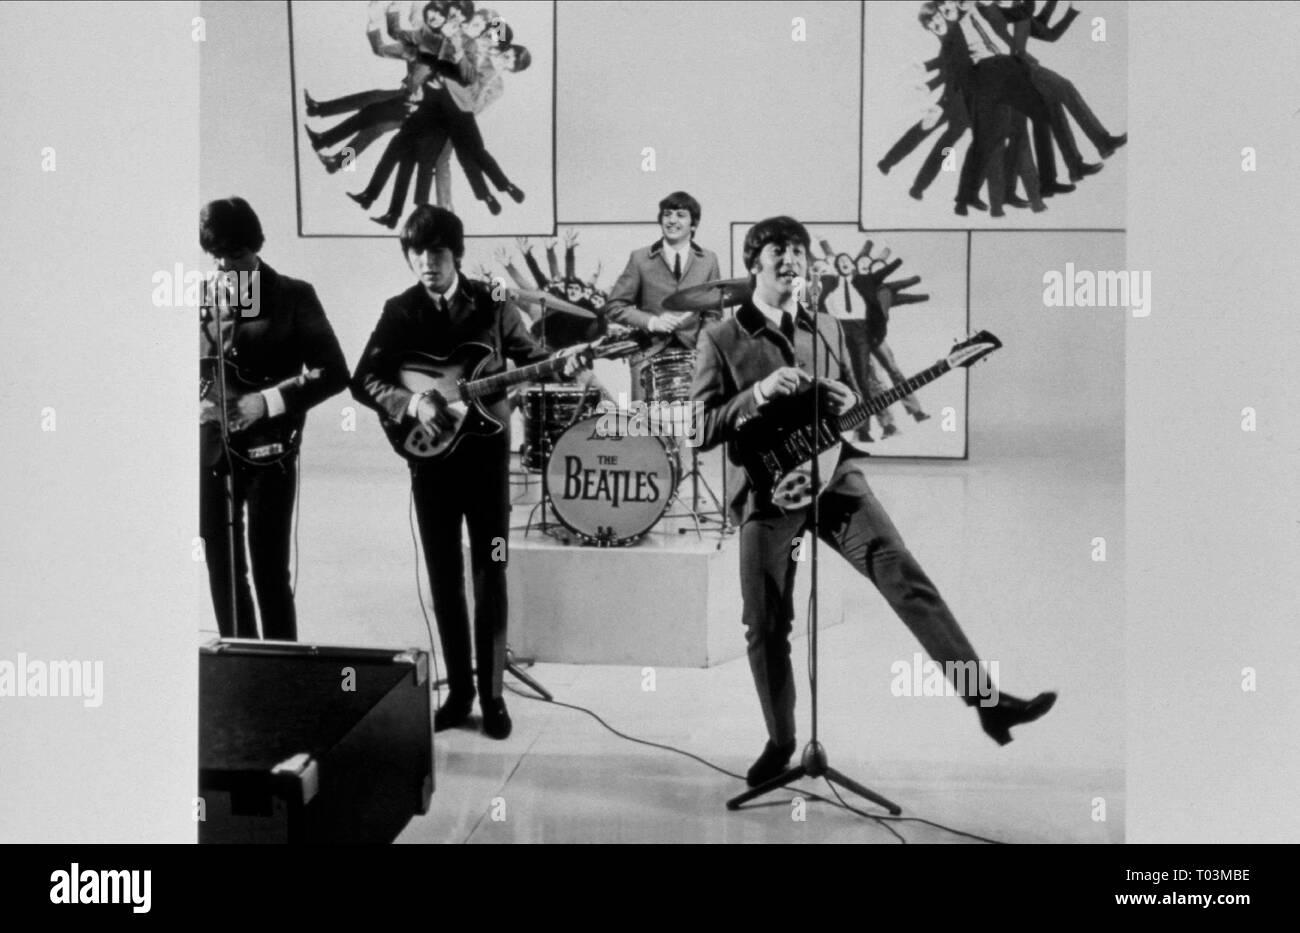 RINGO STARR, GEORGE HARRISON, JOHN LENNON, PAUL MCCARTNEY, A HARD DAY'S NIGHT, 1964 - Stock Image